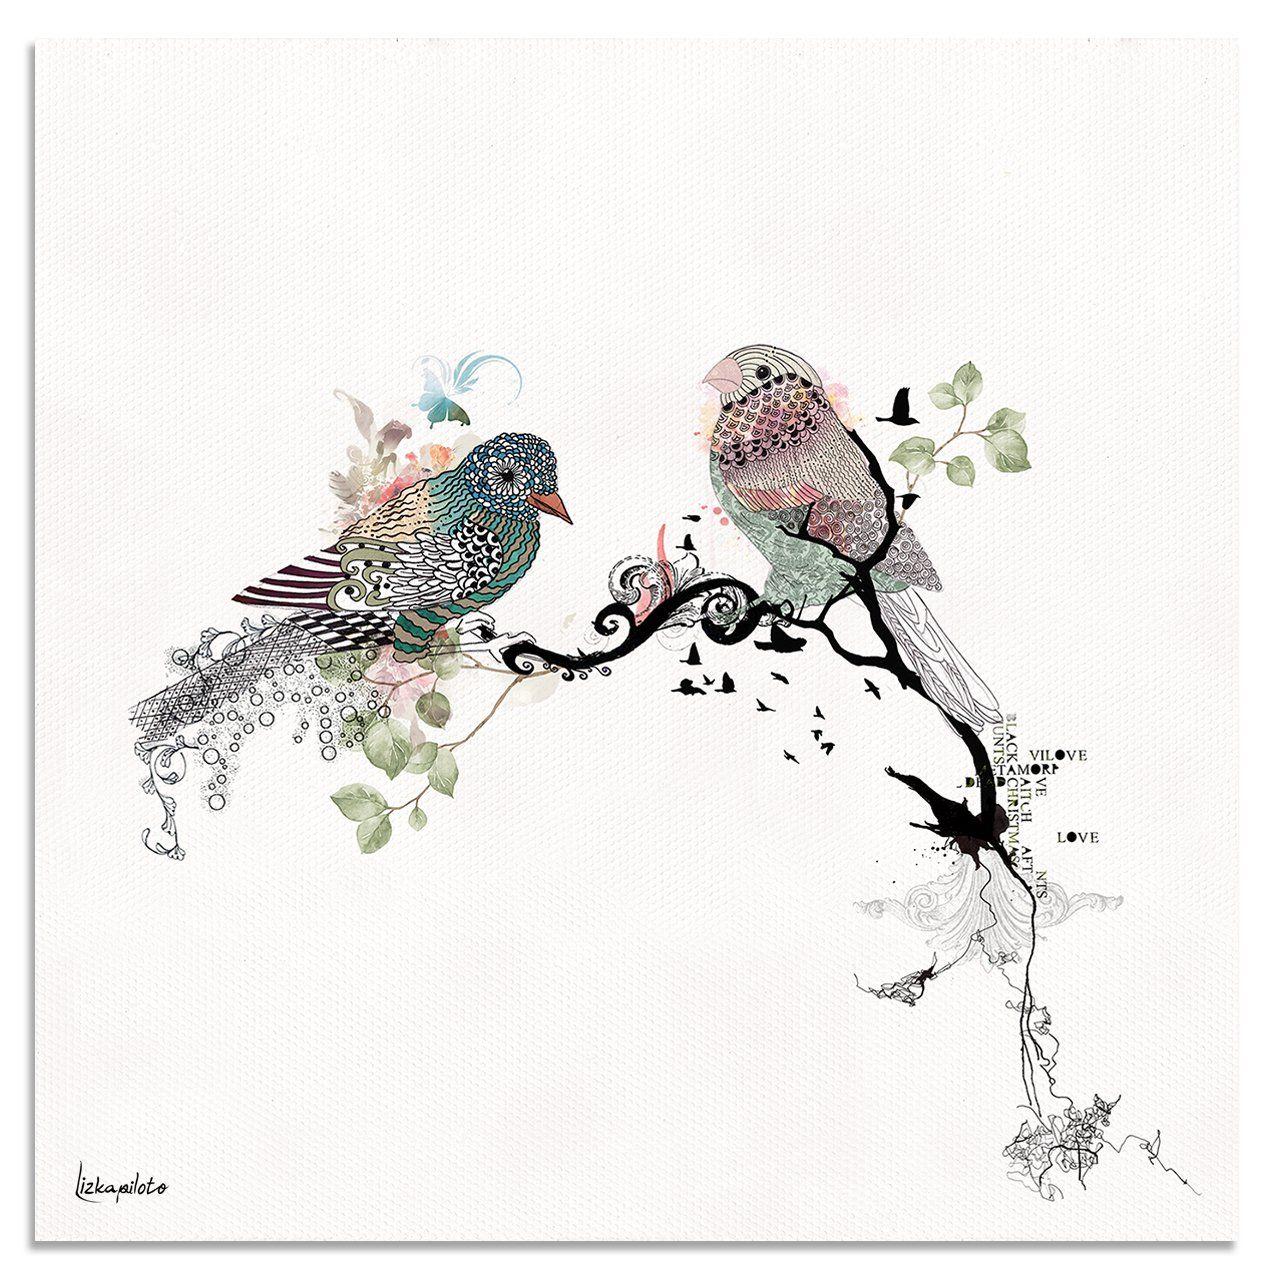 Love Birds Art - Liz Kapiloto Art & Design. a beautiful, romantic birds art print of an original watercolor and black ink artwork. arrives in a varius sizes. #birdart #illustration #lovebird #blackink #painting #art #artist #artforsale #love #bedroomart #artprint #wallart #artshub #artlover #lizkapiloto